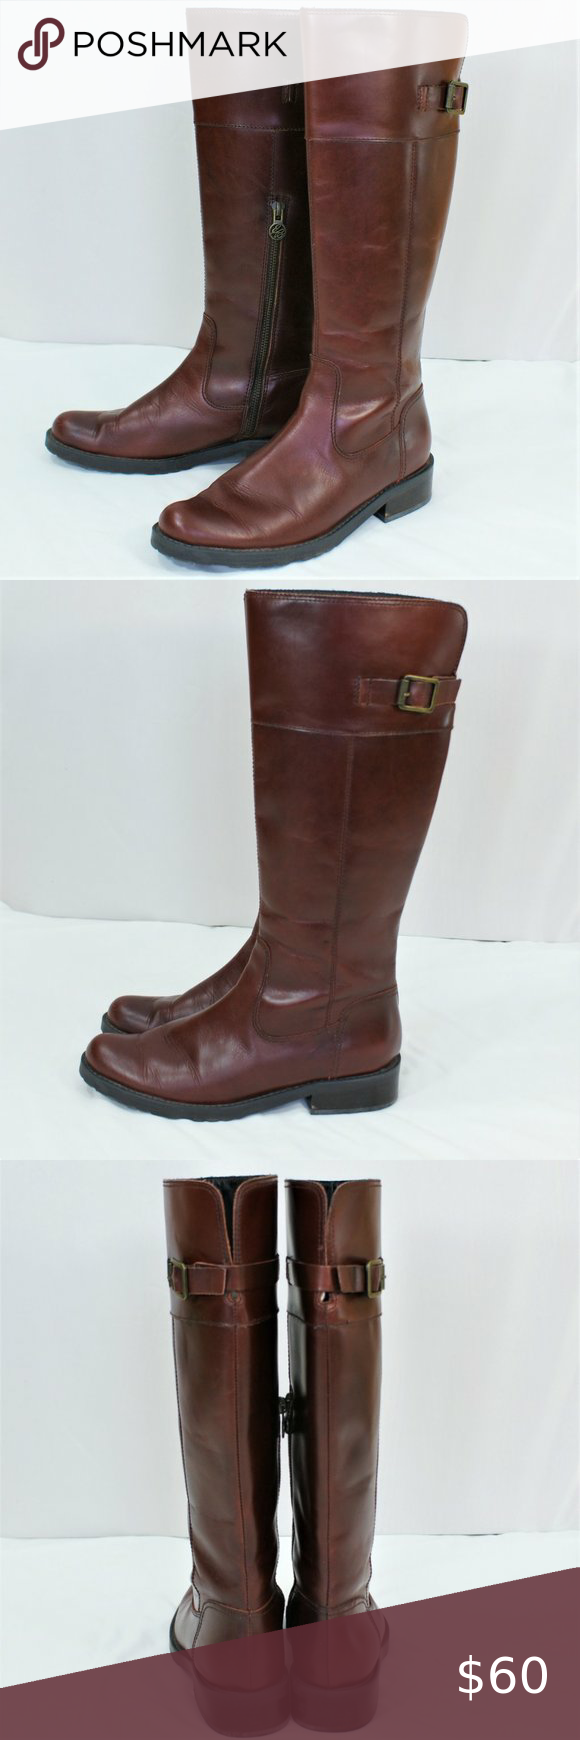 EUC Eddie Bauer leather riding boots